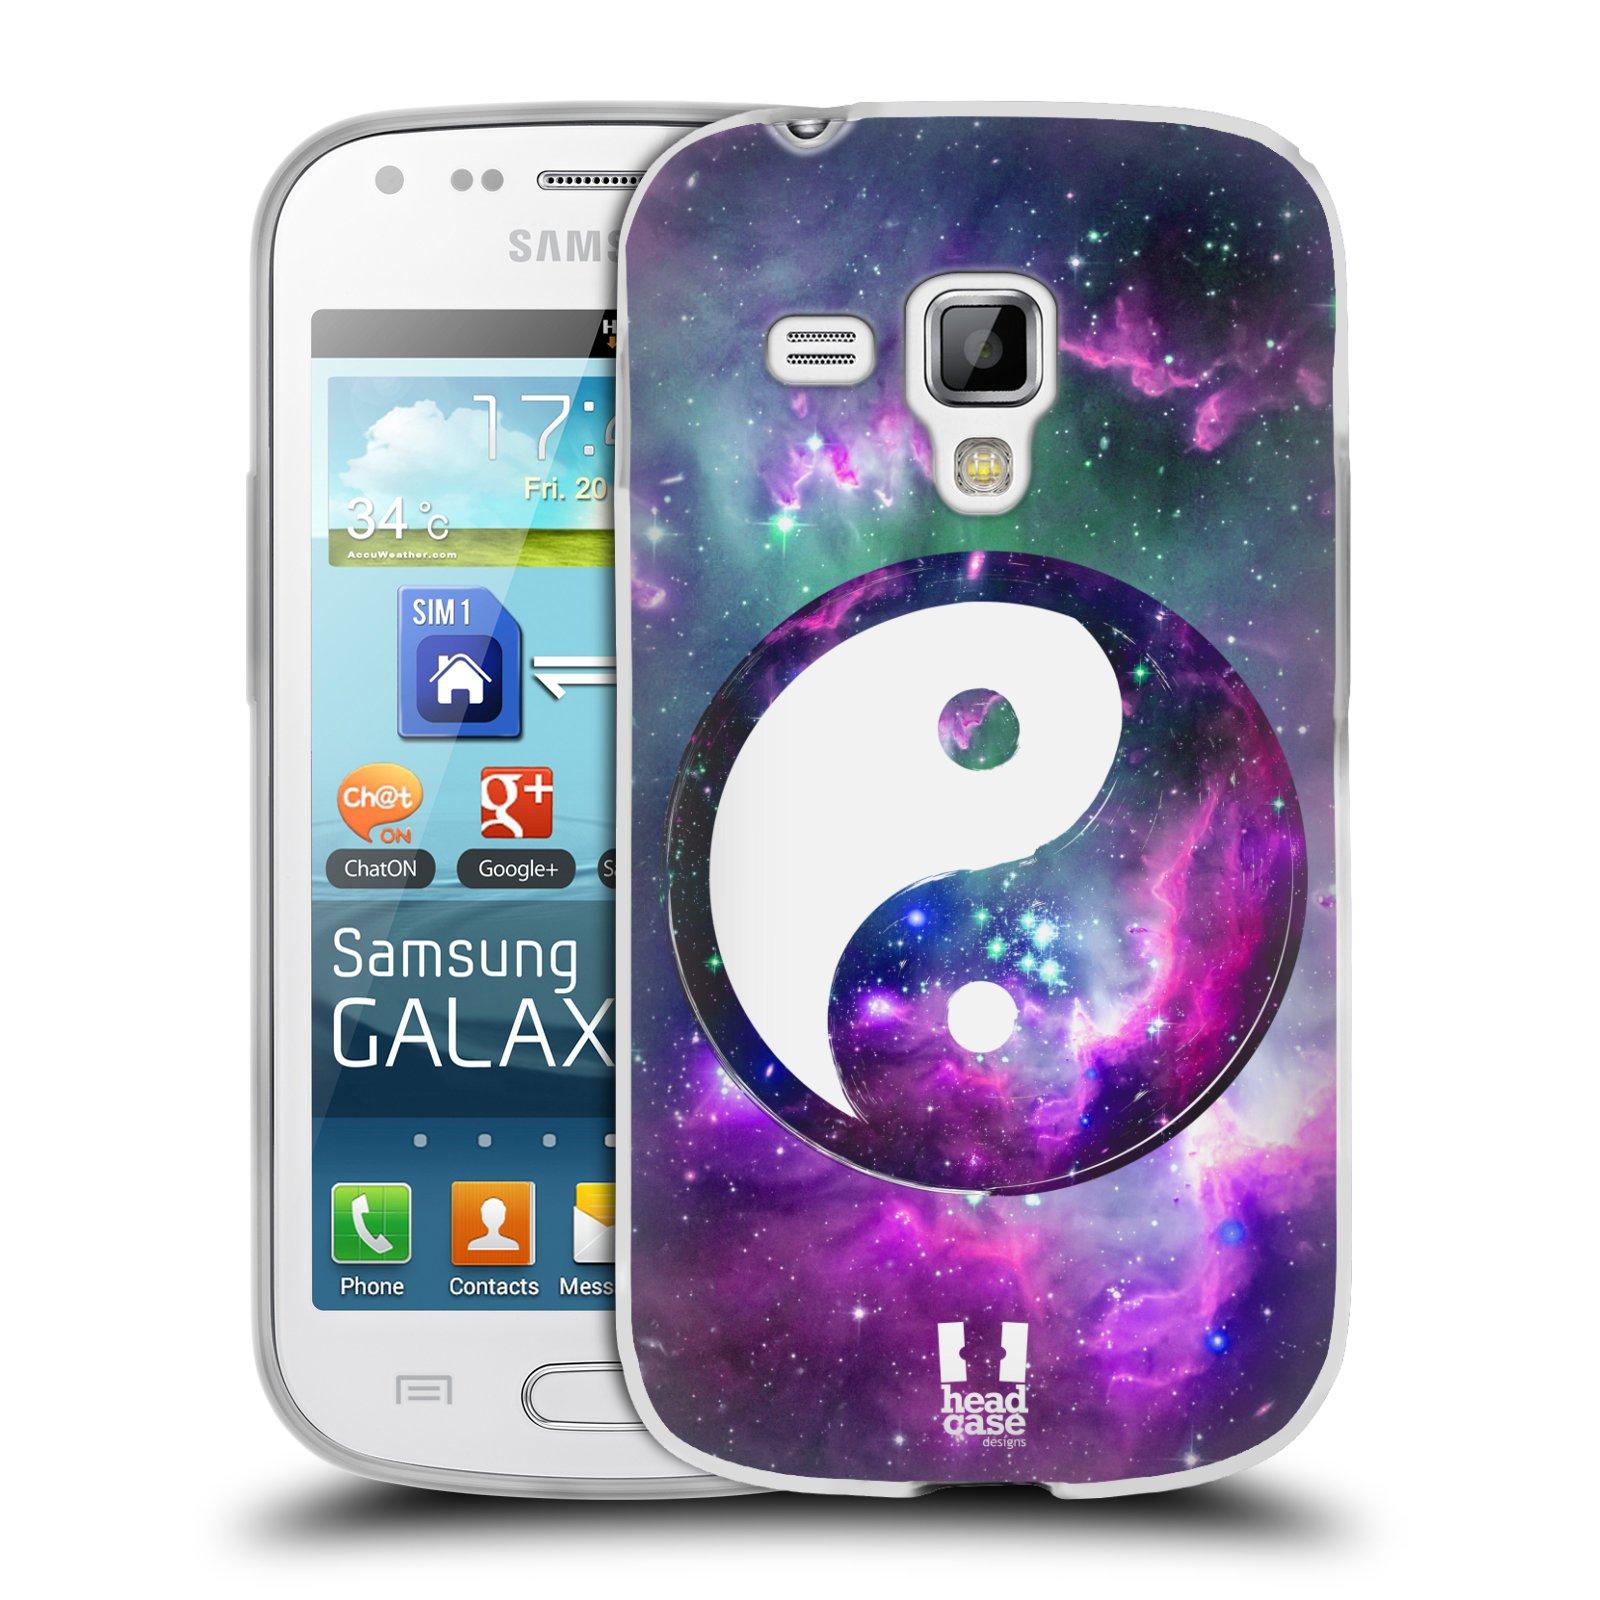 Silikonové pouzdro na mobil Samsung Galaxy Trend HEAD CASE YIn a Yang PURPLE (Silikonový kryt či obal na mobilní telefon Samsung Galaxy Trend GT-S7560)